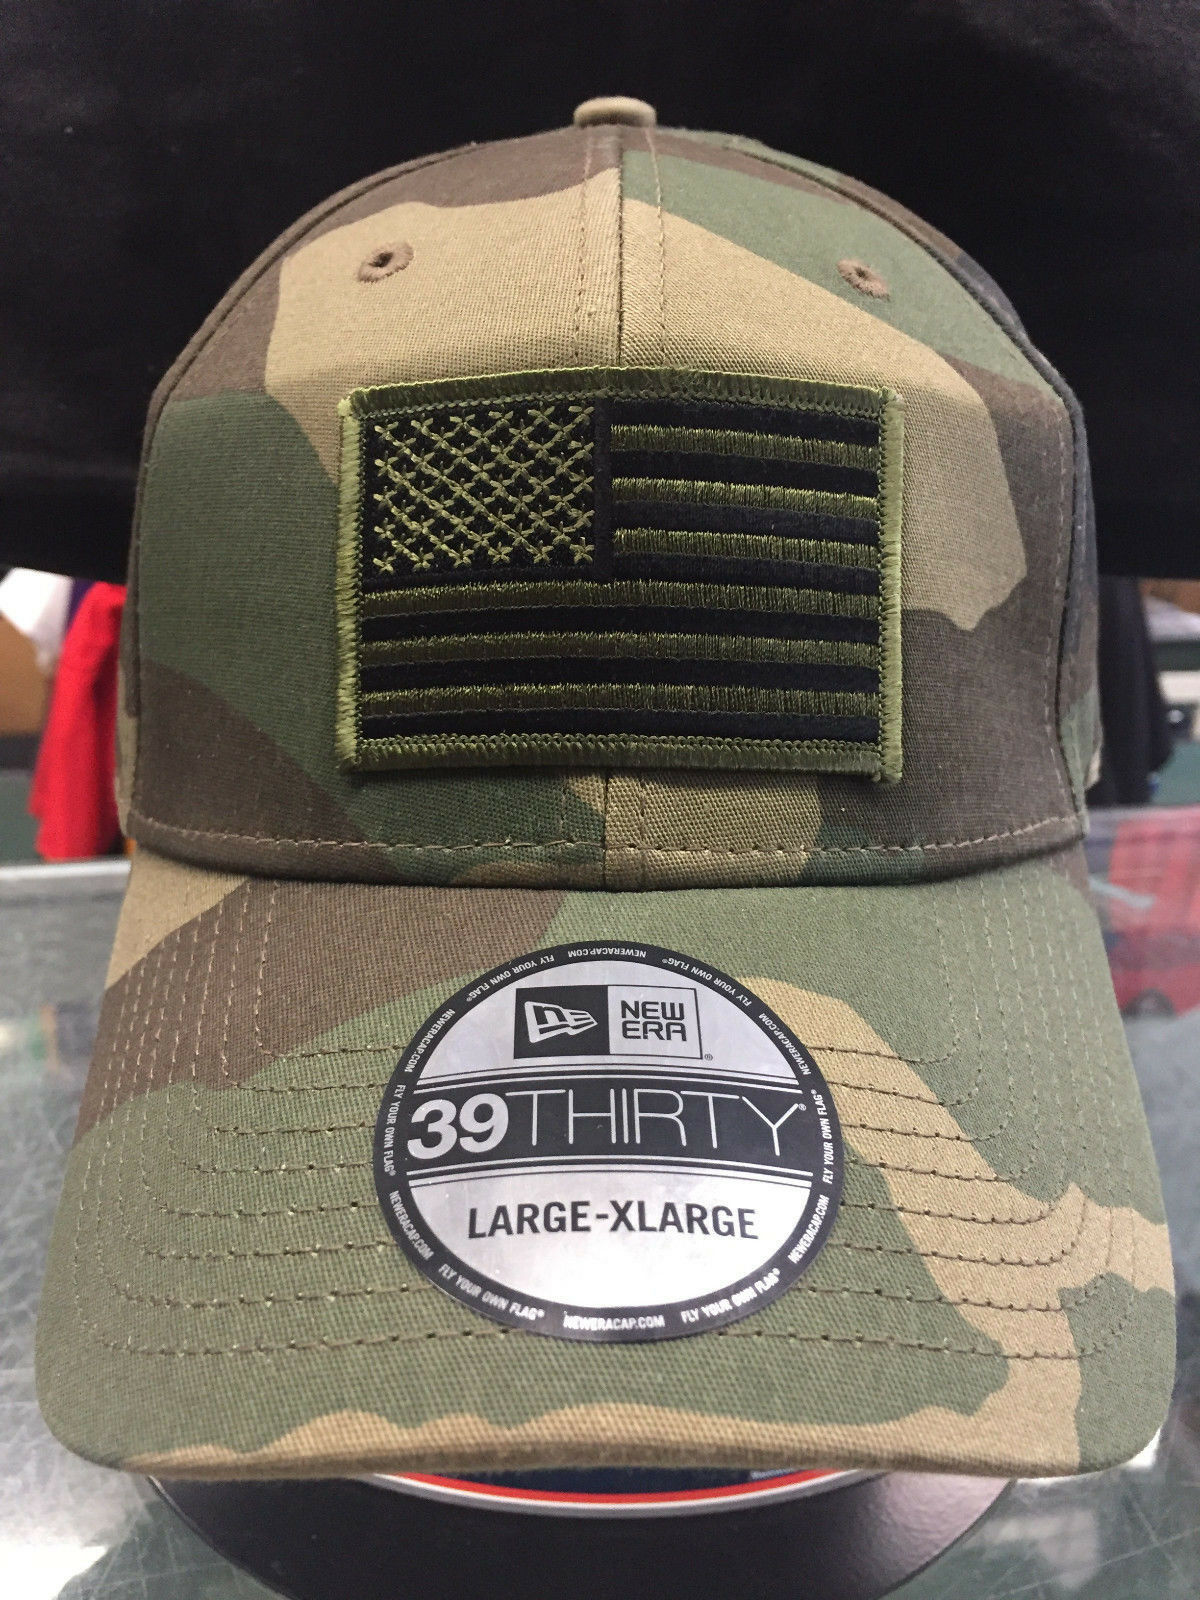 ne1000 camo flexfit hat cap with green